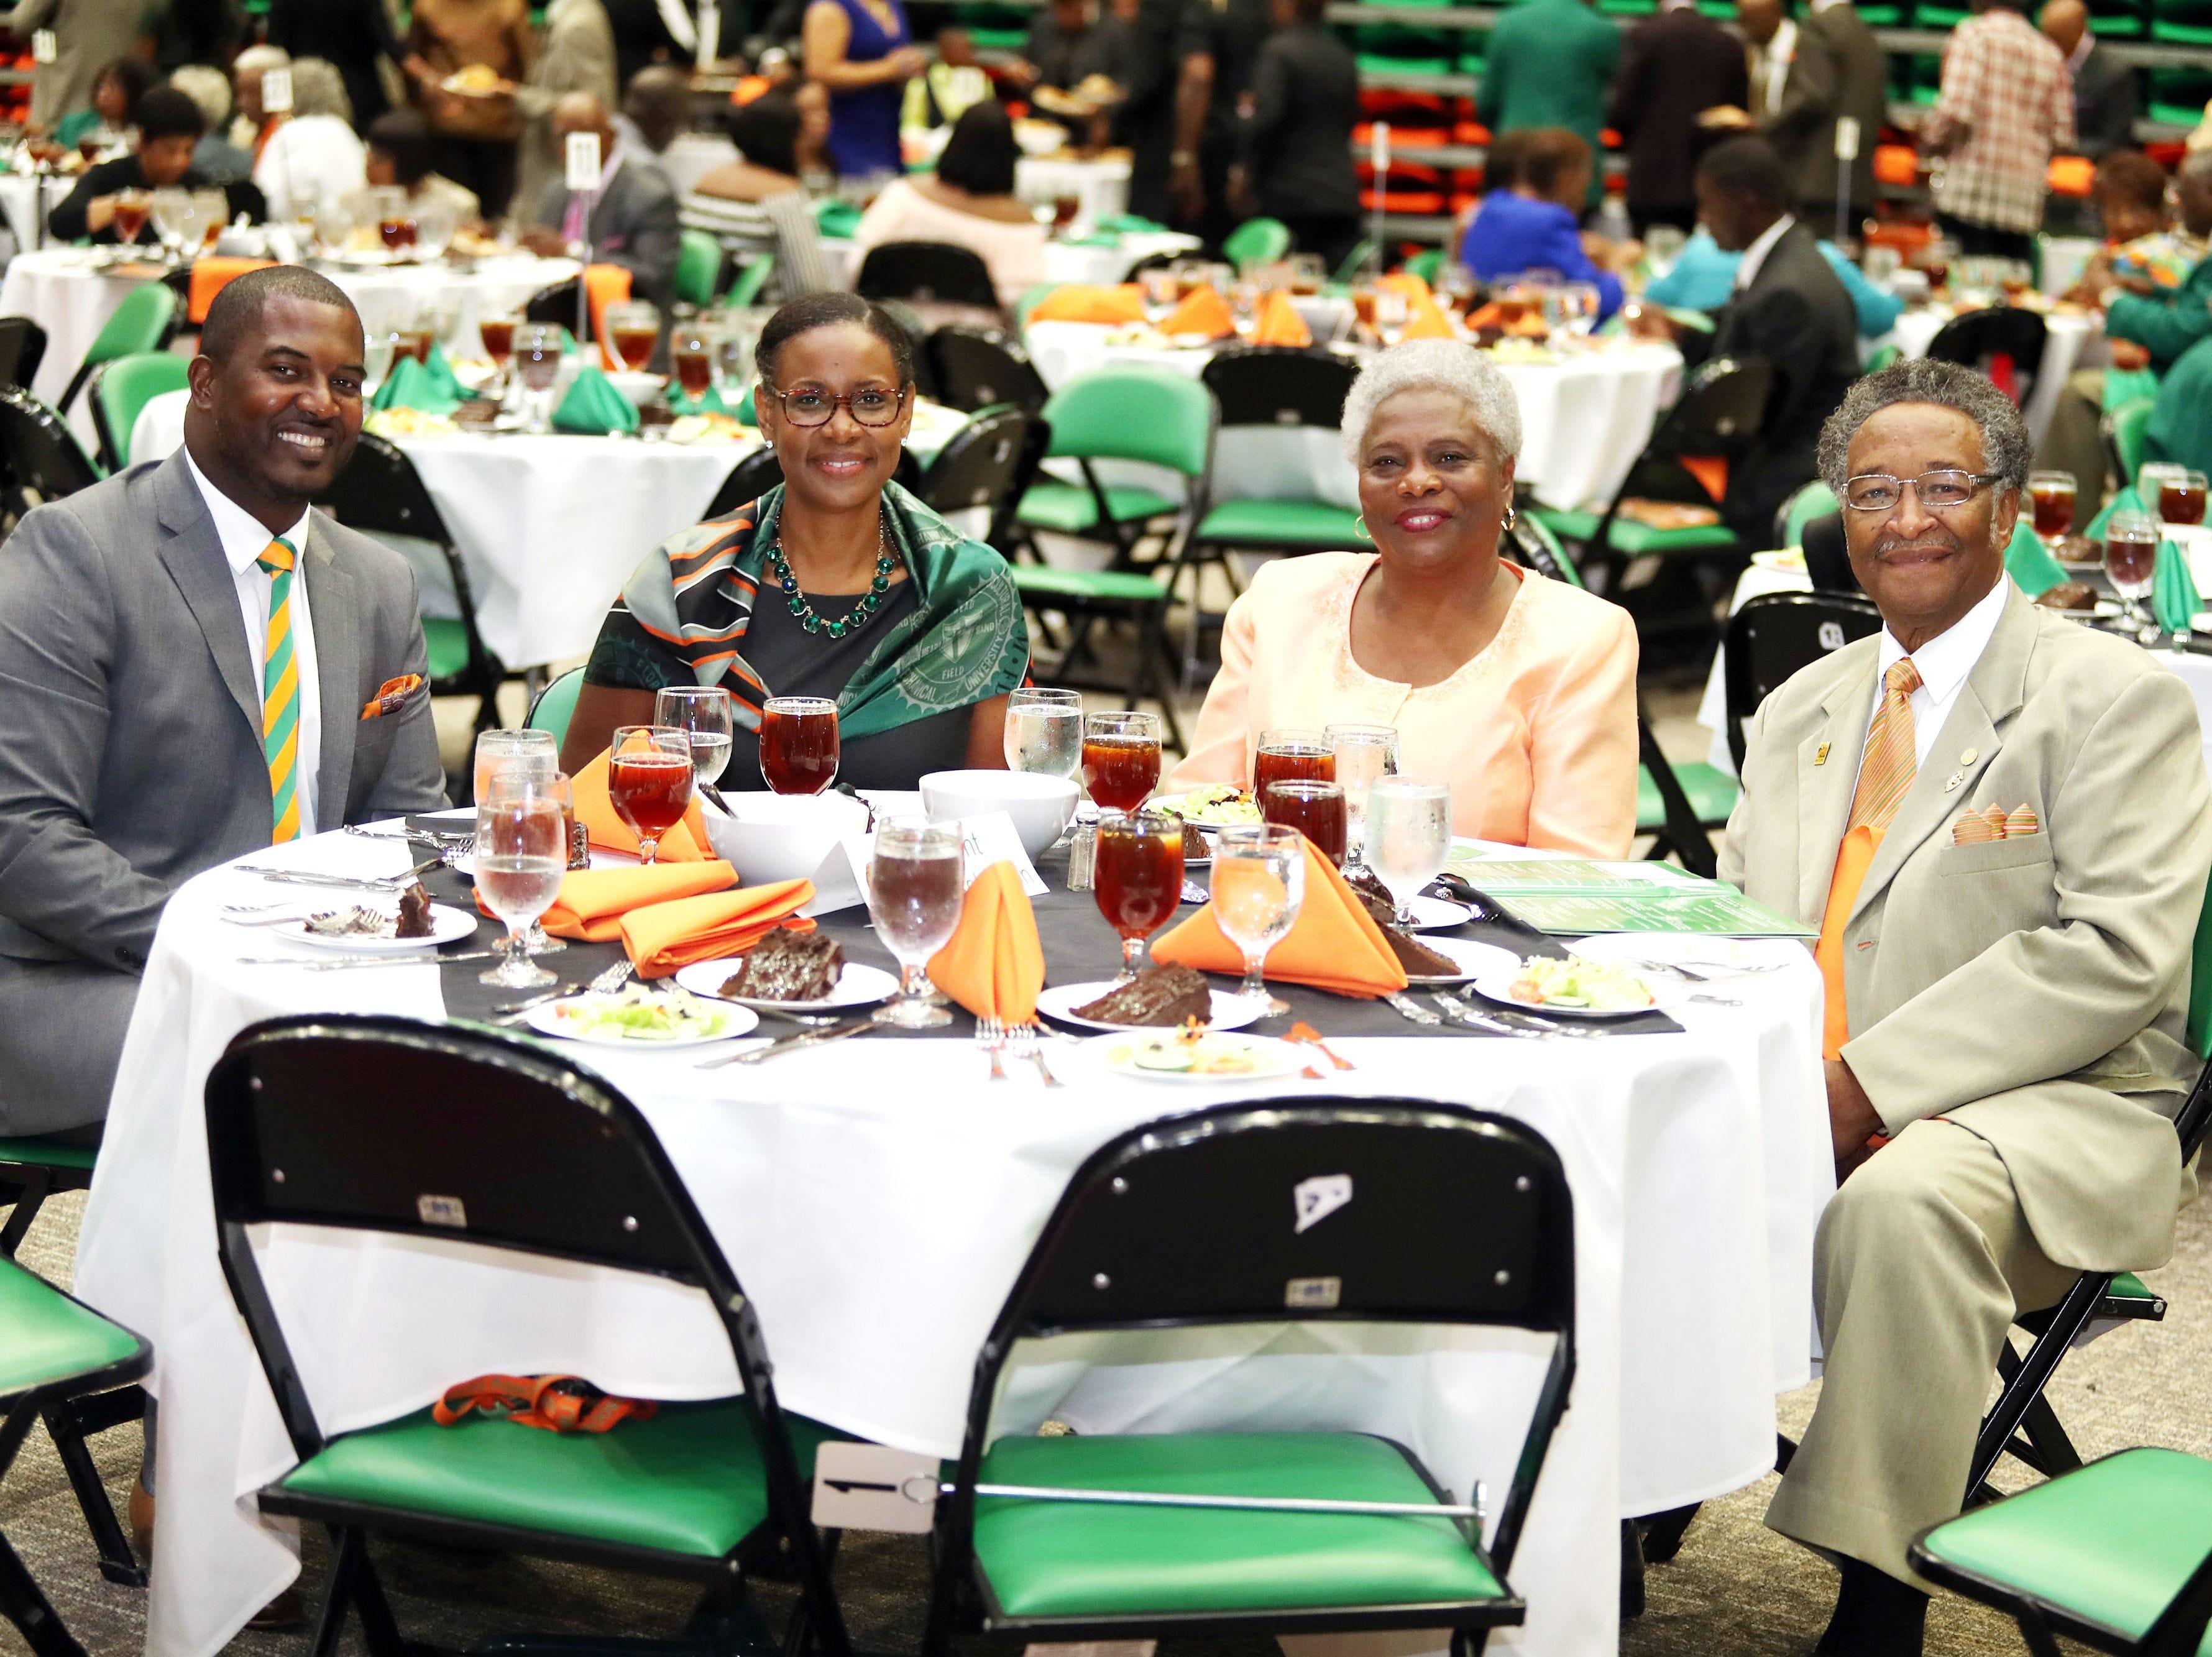 FAMU football coach Willie Simmons, Sharon Robinson, Barbara Smith and Dr. Walter Smith.